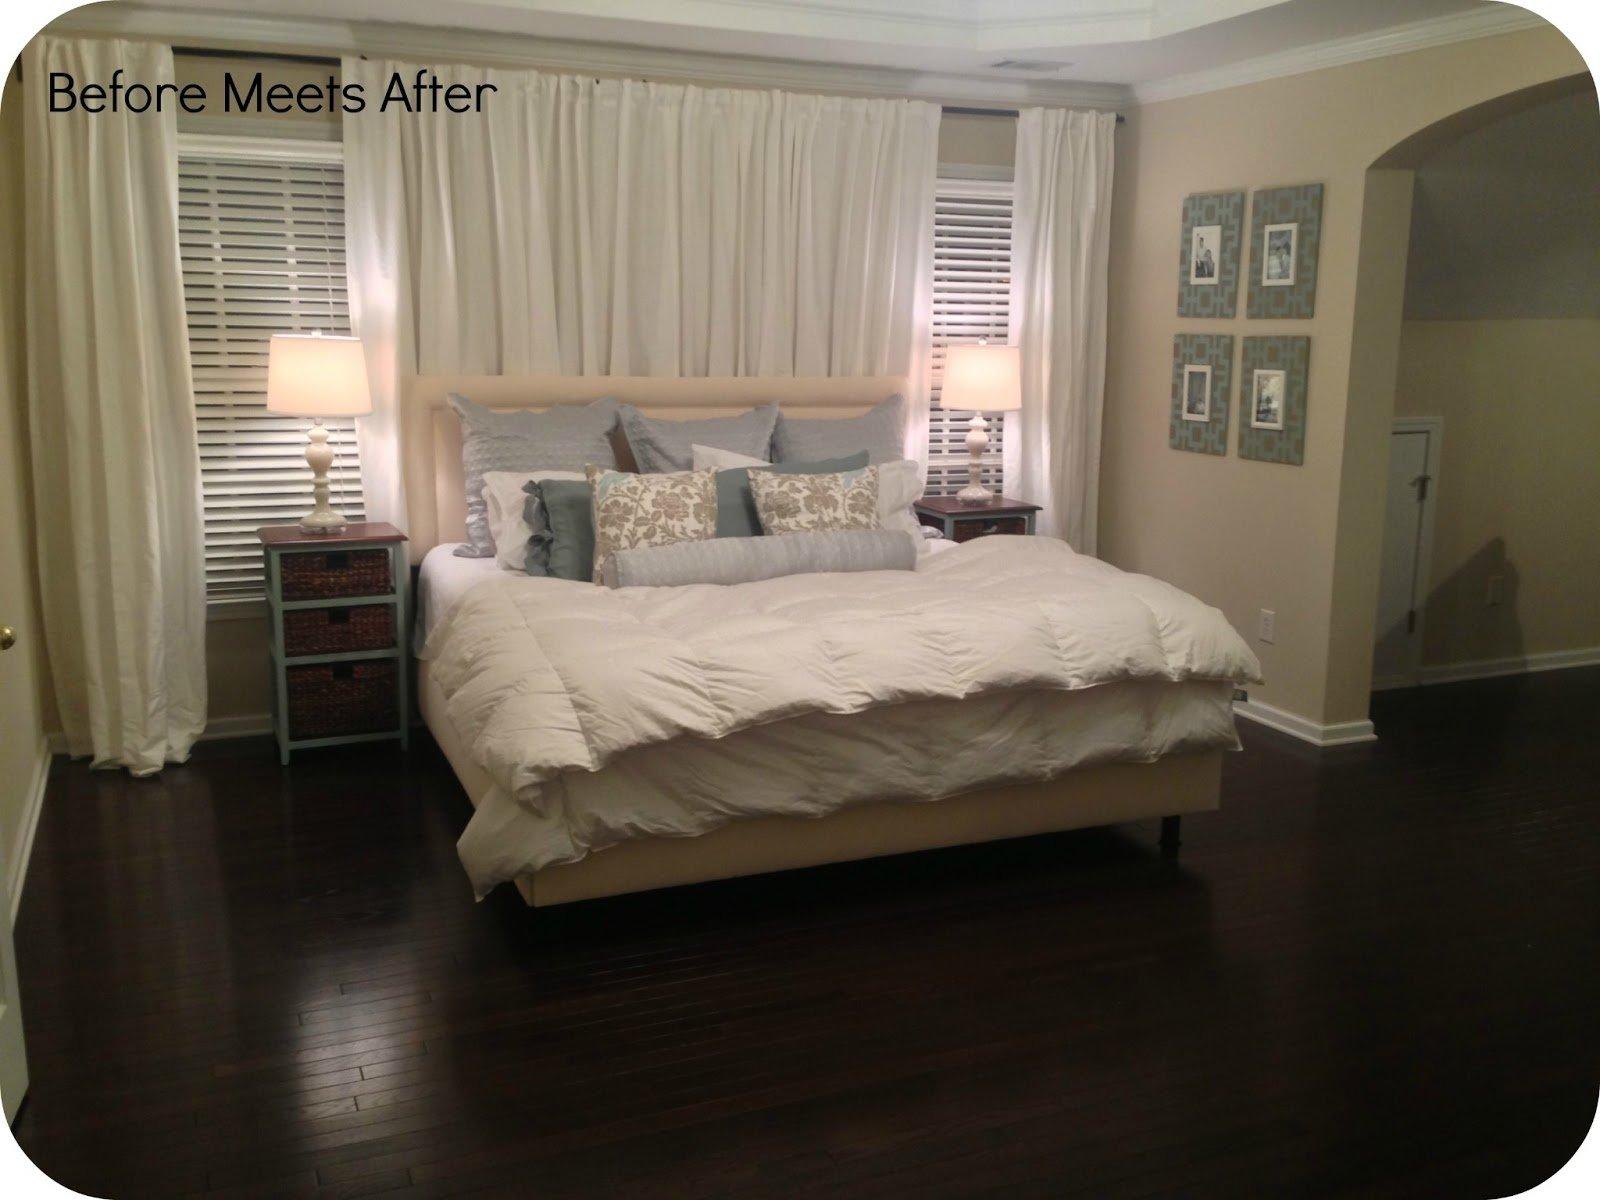 10 Fabulous Master Bedroom Window Treatment Ideas curtains bedroom 16 nice curtain ideas for master bedroom window